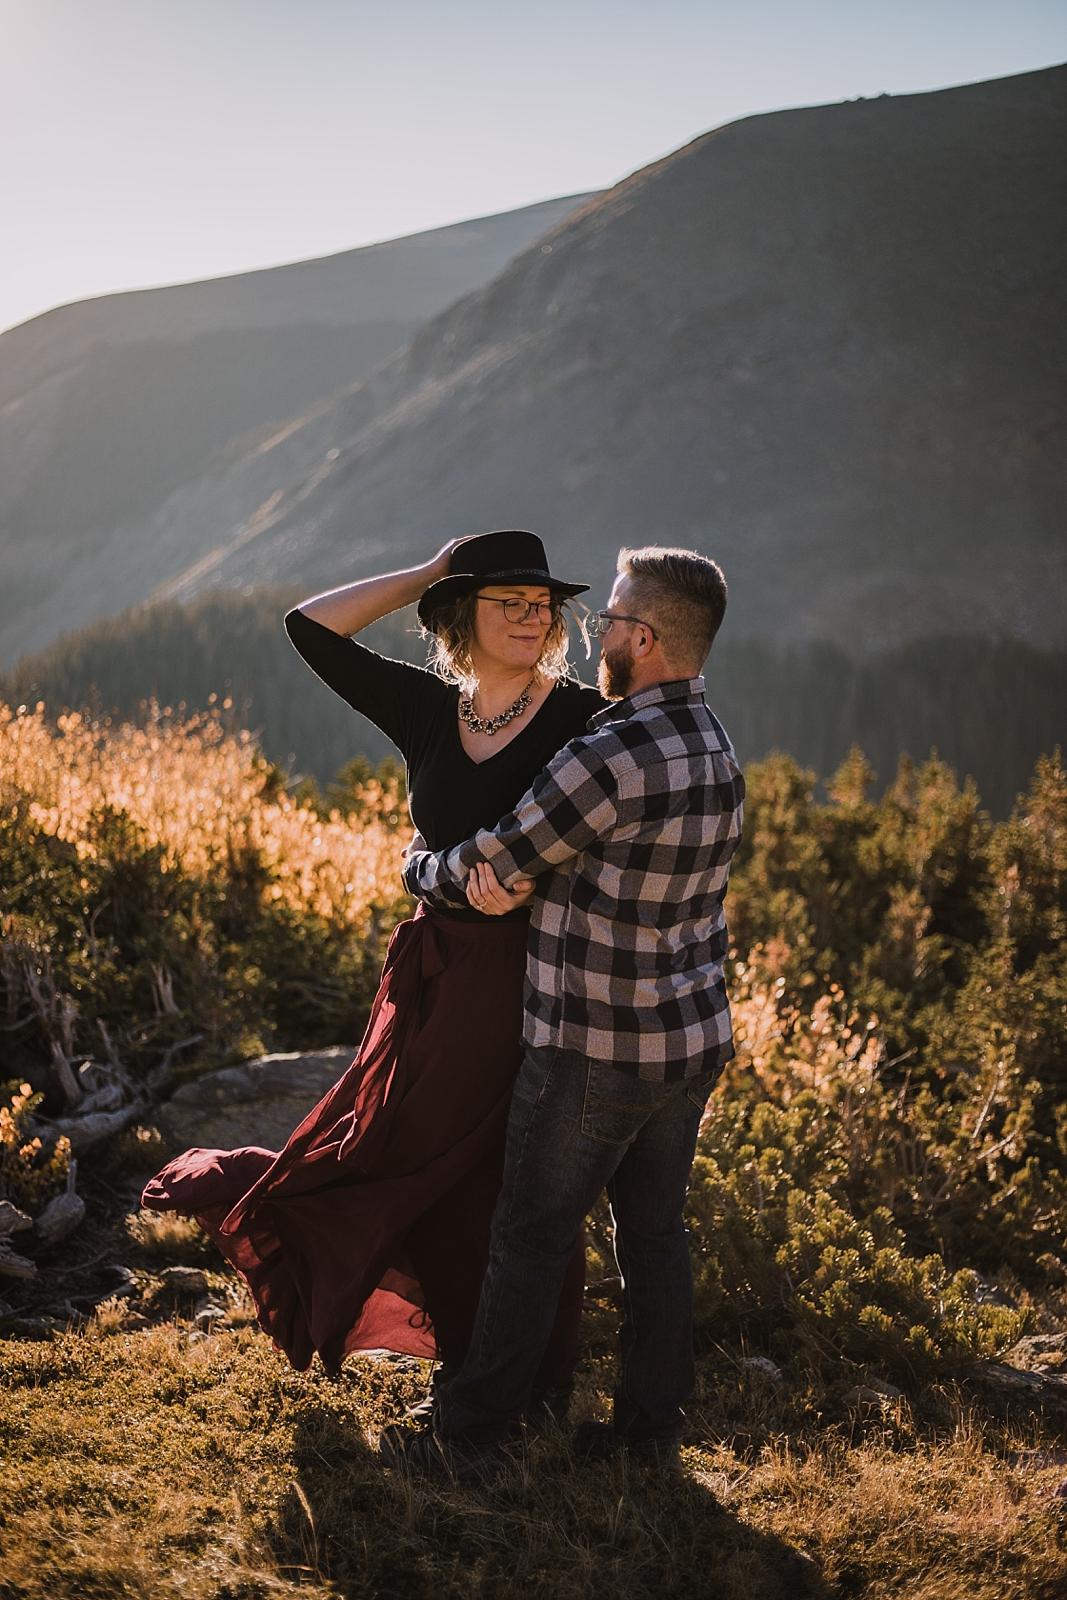 sunrise at james peak, colorado 13er, hike little echo lake, backpacking james peak wilderness, hike james peak lake, james peak elopement, winter park elopement, backpacking winter park